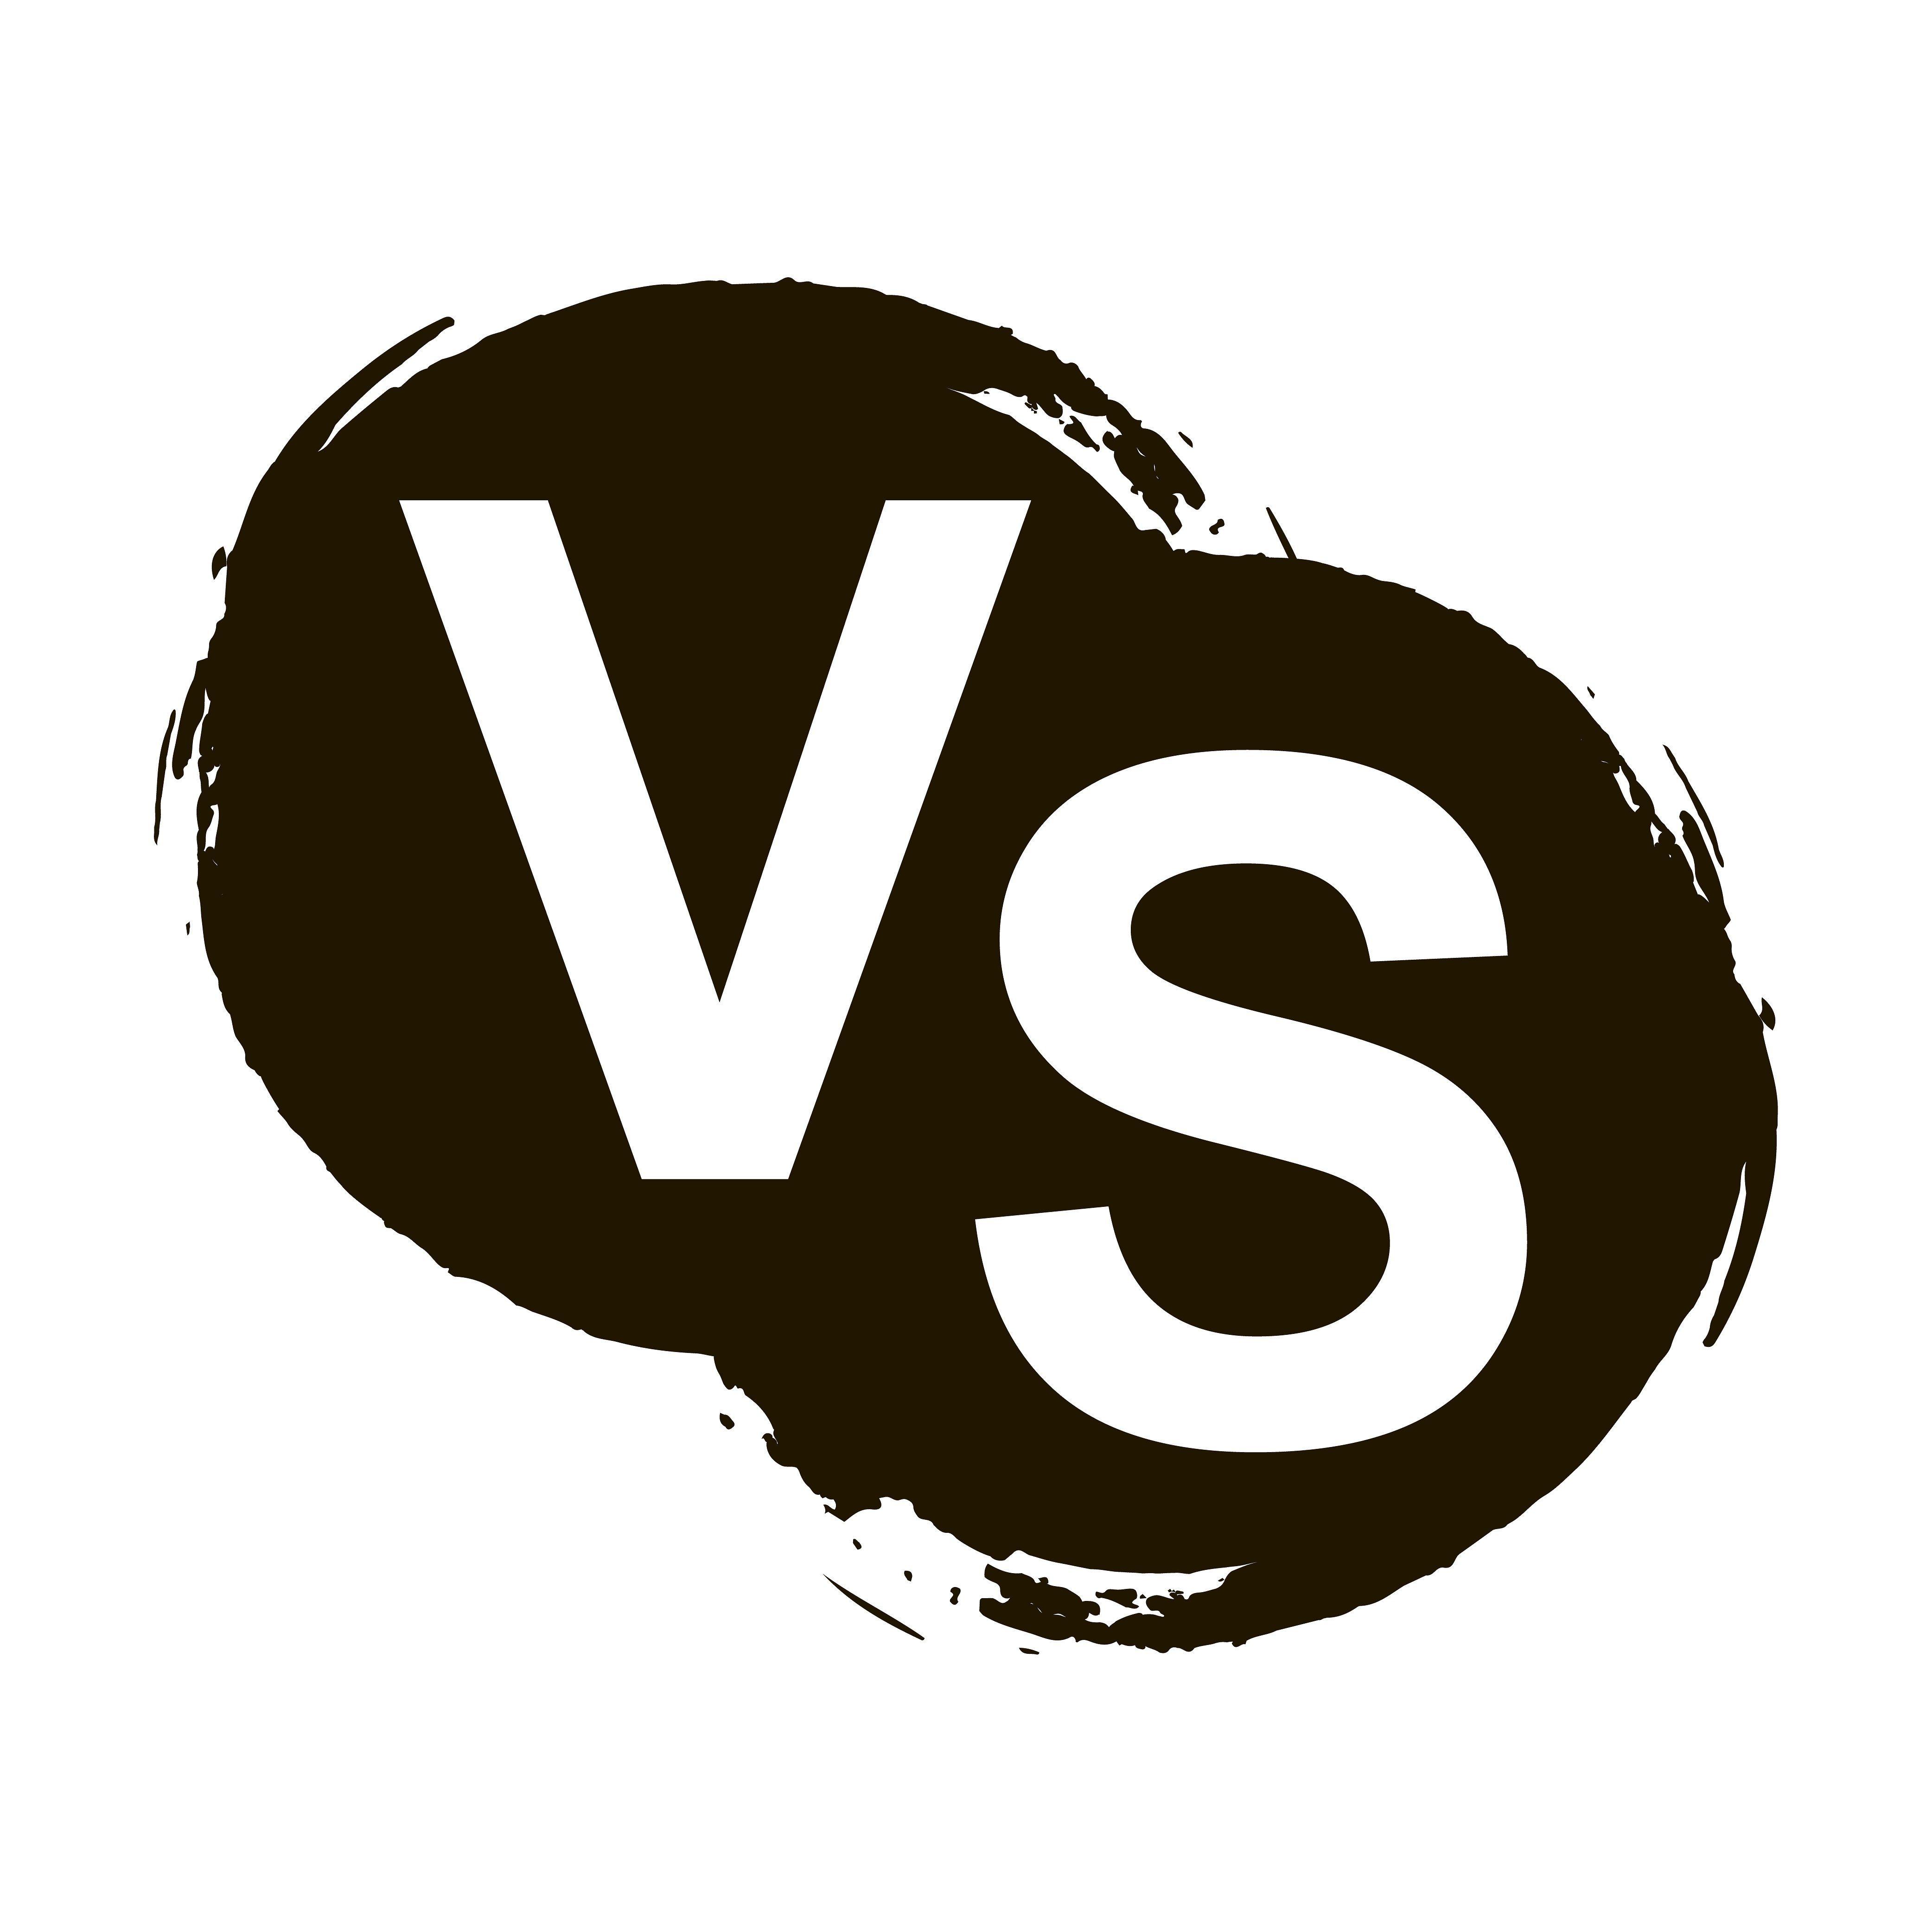 Versus letters or vs logo by vivat on creativemarket